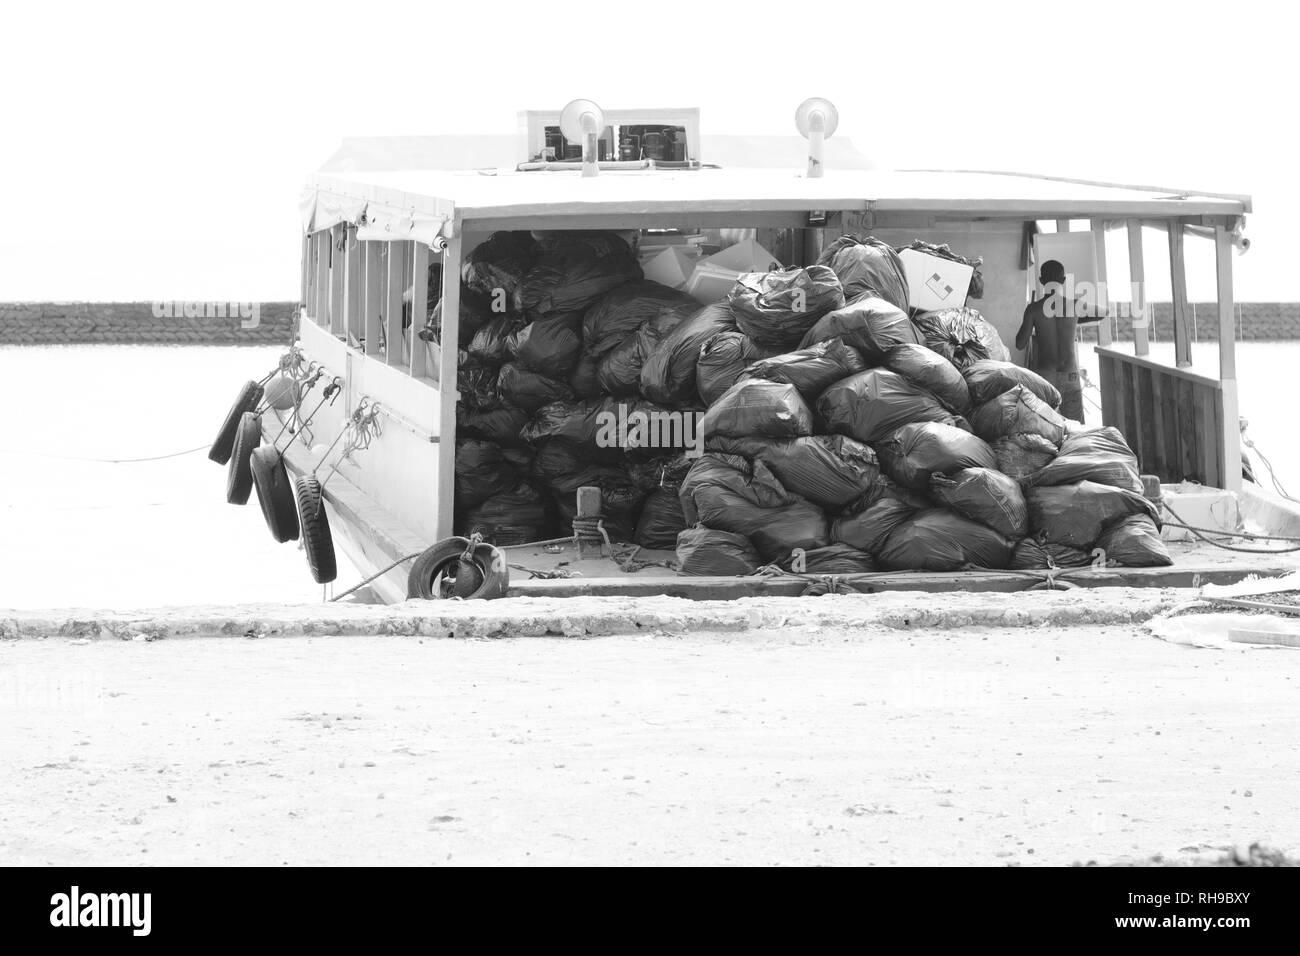 Ari Atoll, Maldives - 24 December 2018: A maldivian sailor is carrying trash bags with his boat - Stock Image